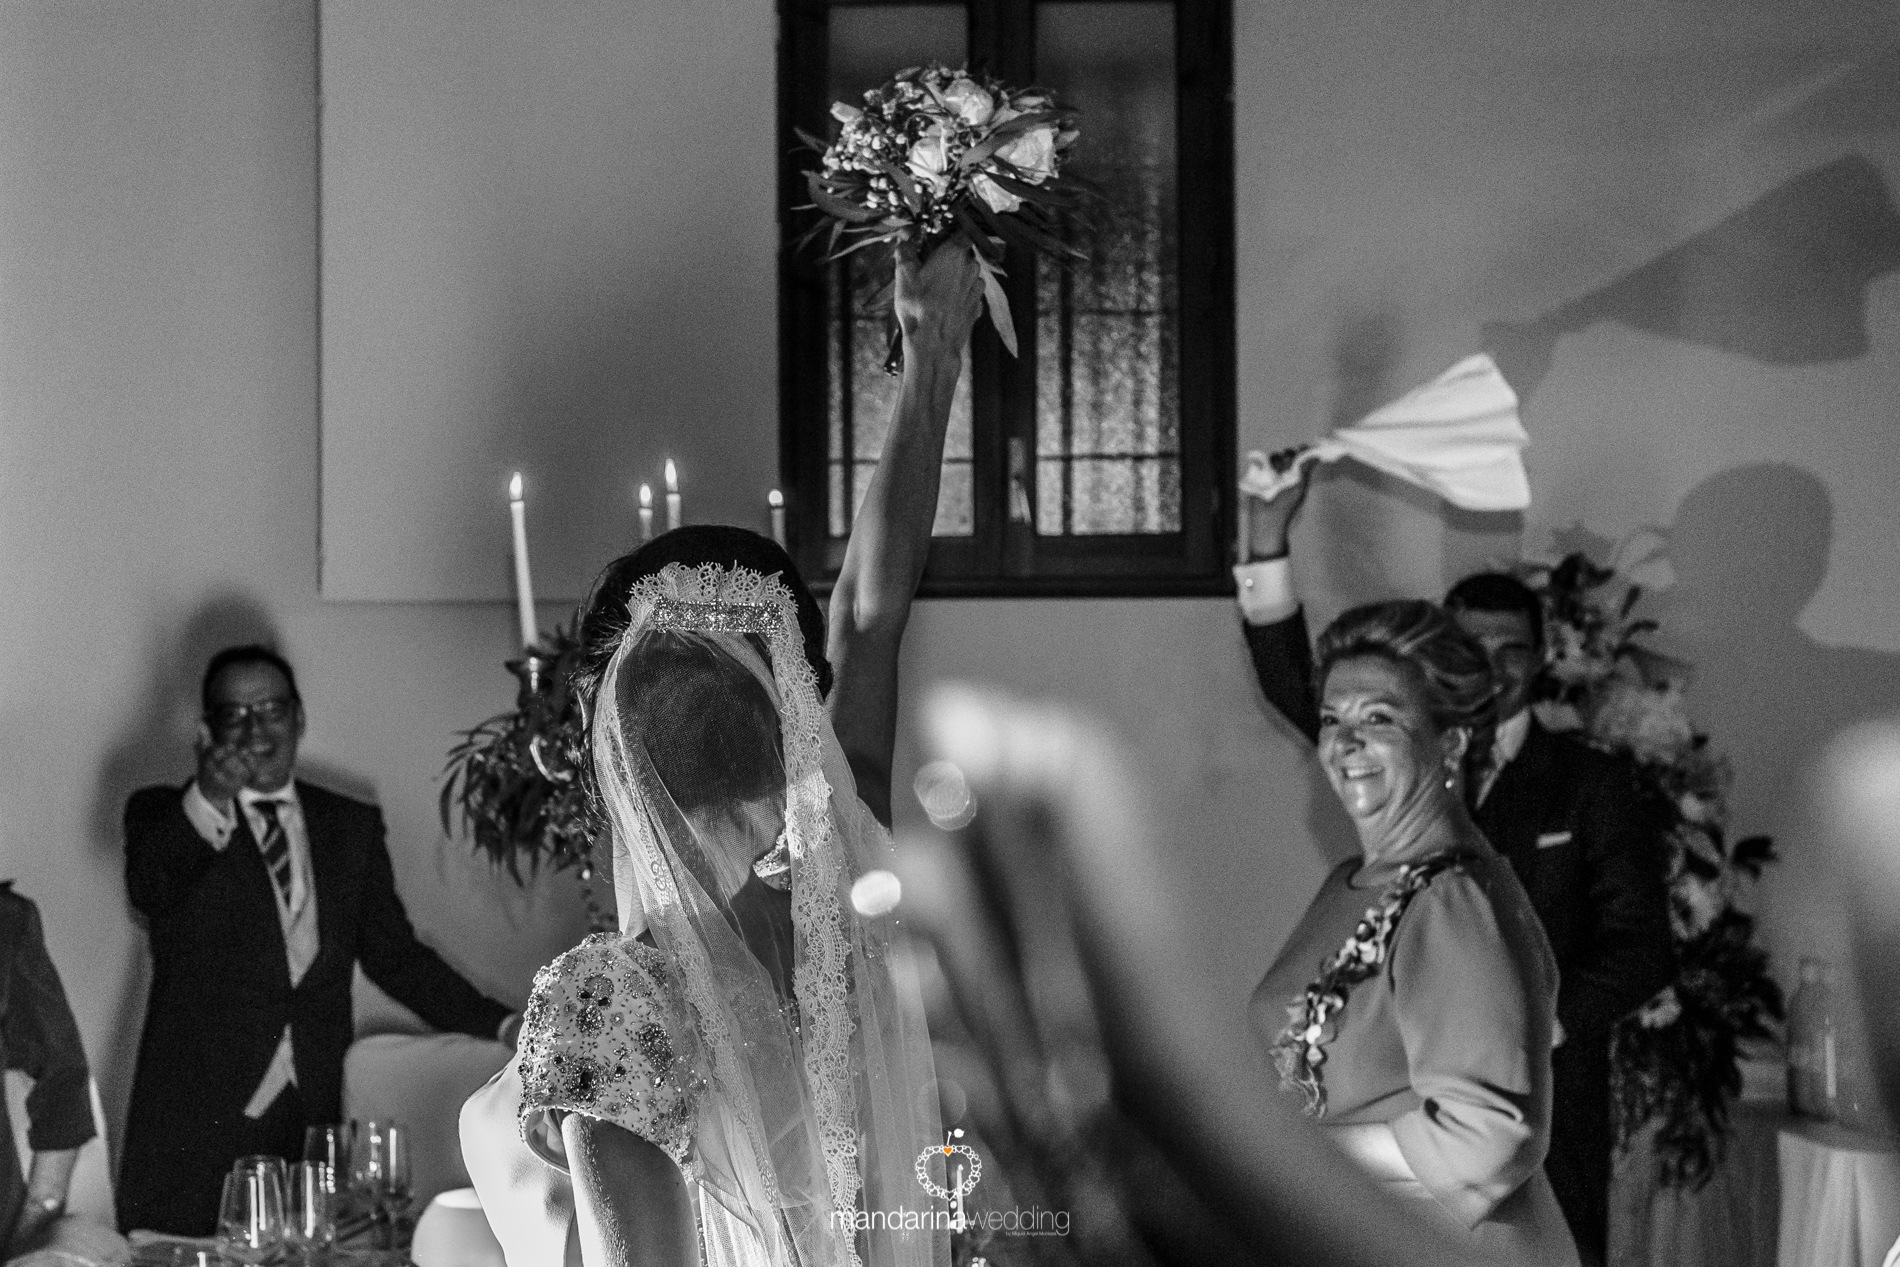 mandaria wedding, fotografos de boda, fotoperiodismo de boda, mejores fotografos de boda, bodas soria, bodas pirineo, bodas Madrid, fotógrafos tarragona_31